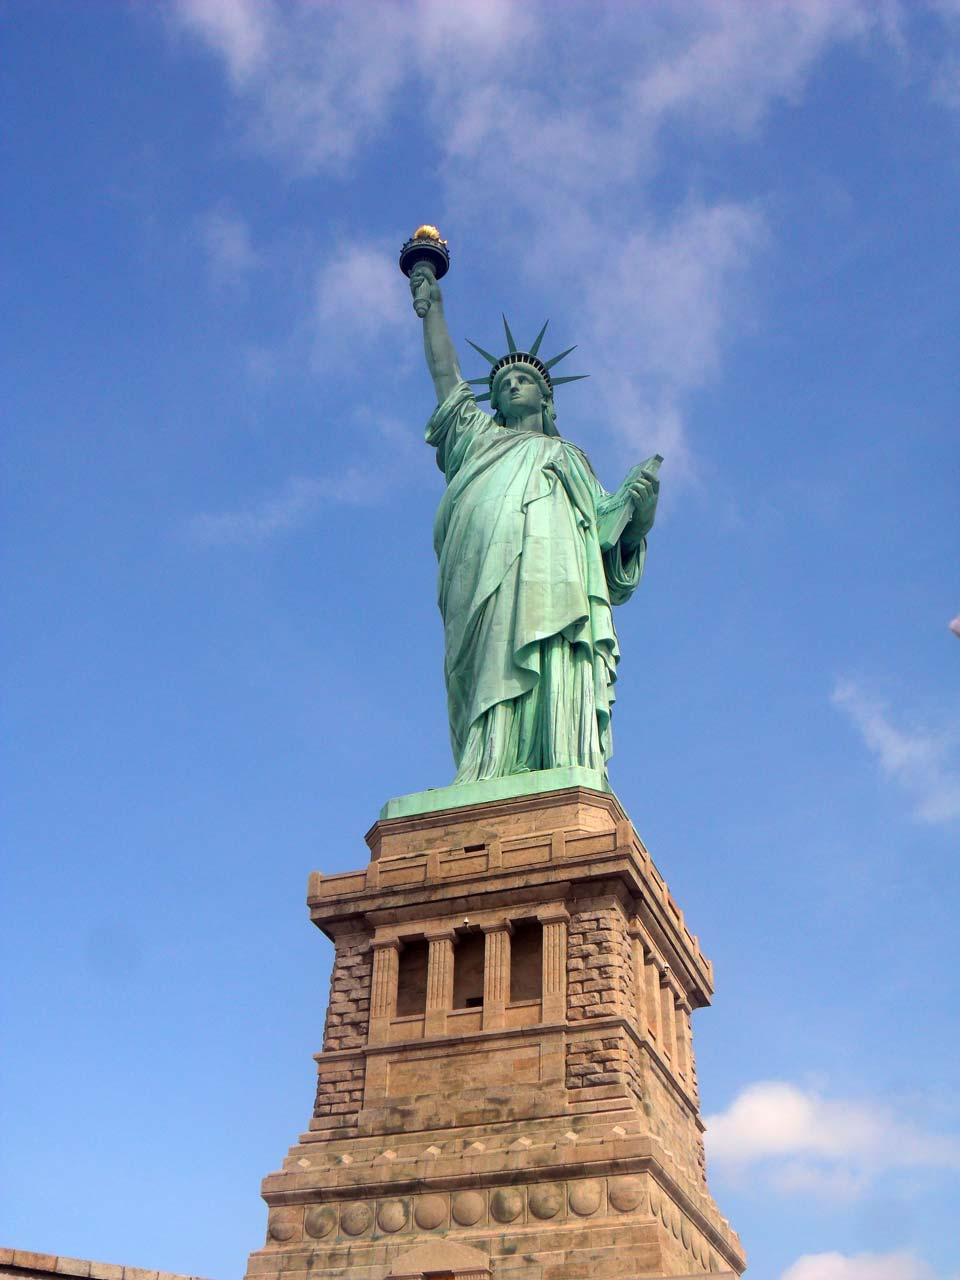 Özgürlük Heykeli ( Statue of Liberty)